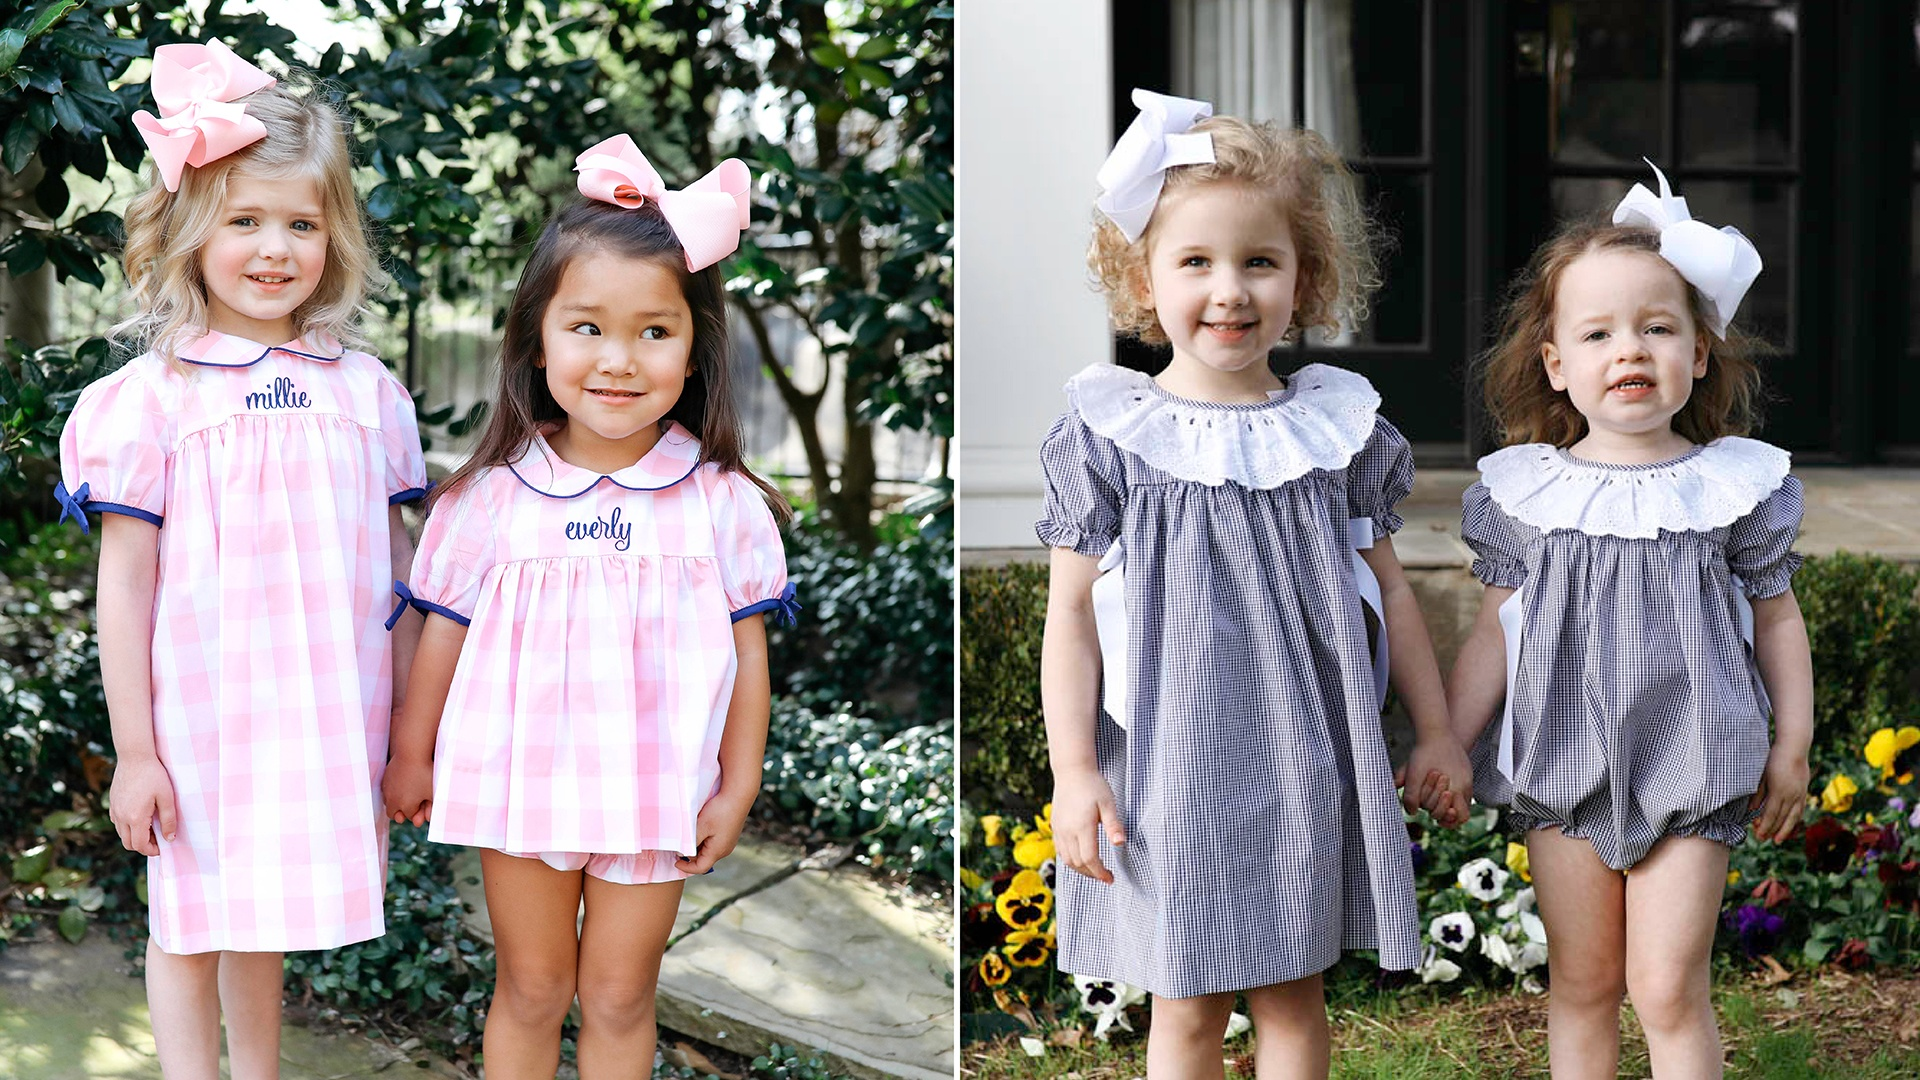 Girls Spring Clothing - Girls Summer Clothing